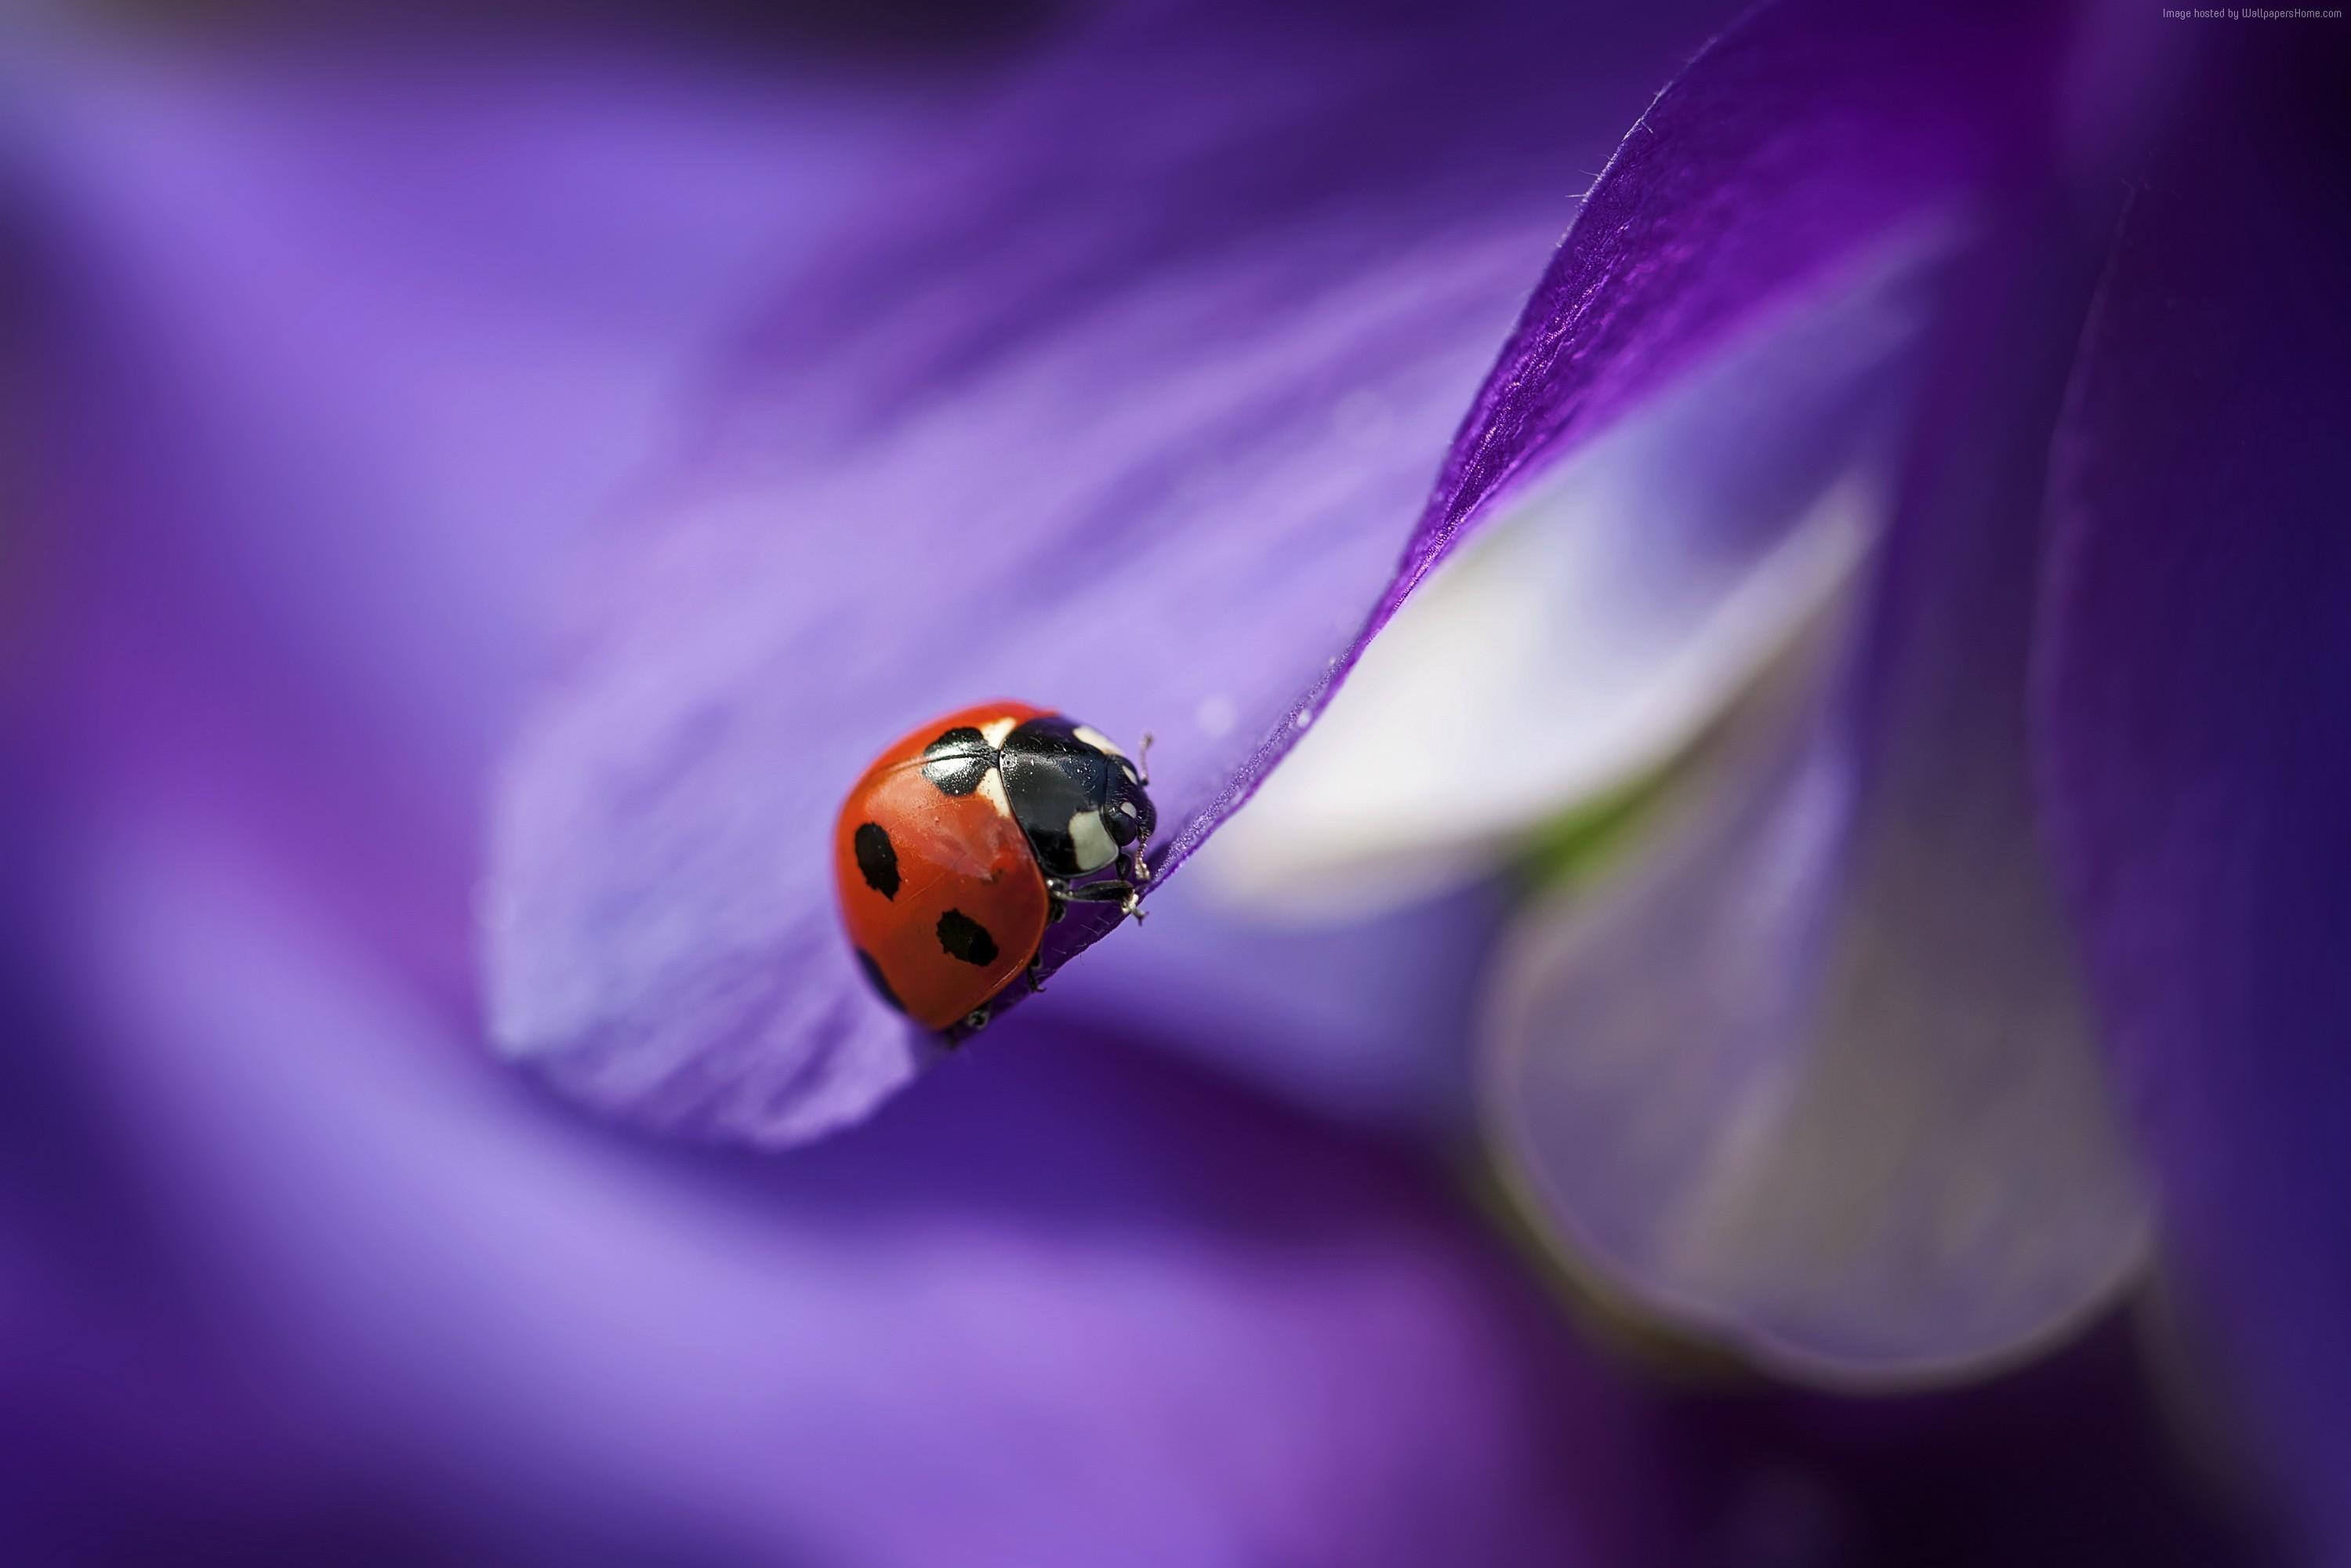 Beautiful-ladybug-on-a-purple-petal-Beautiful-Macro-HD-Download-for-iPad-an-wallpaper-wp3603077